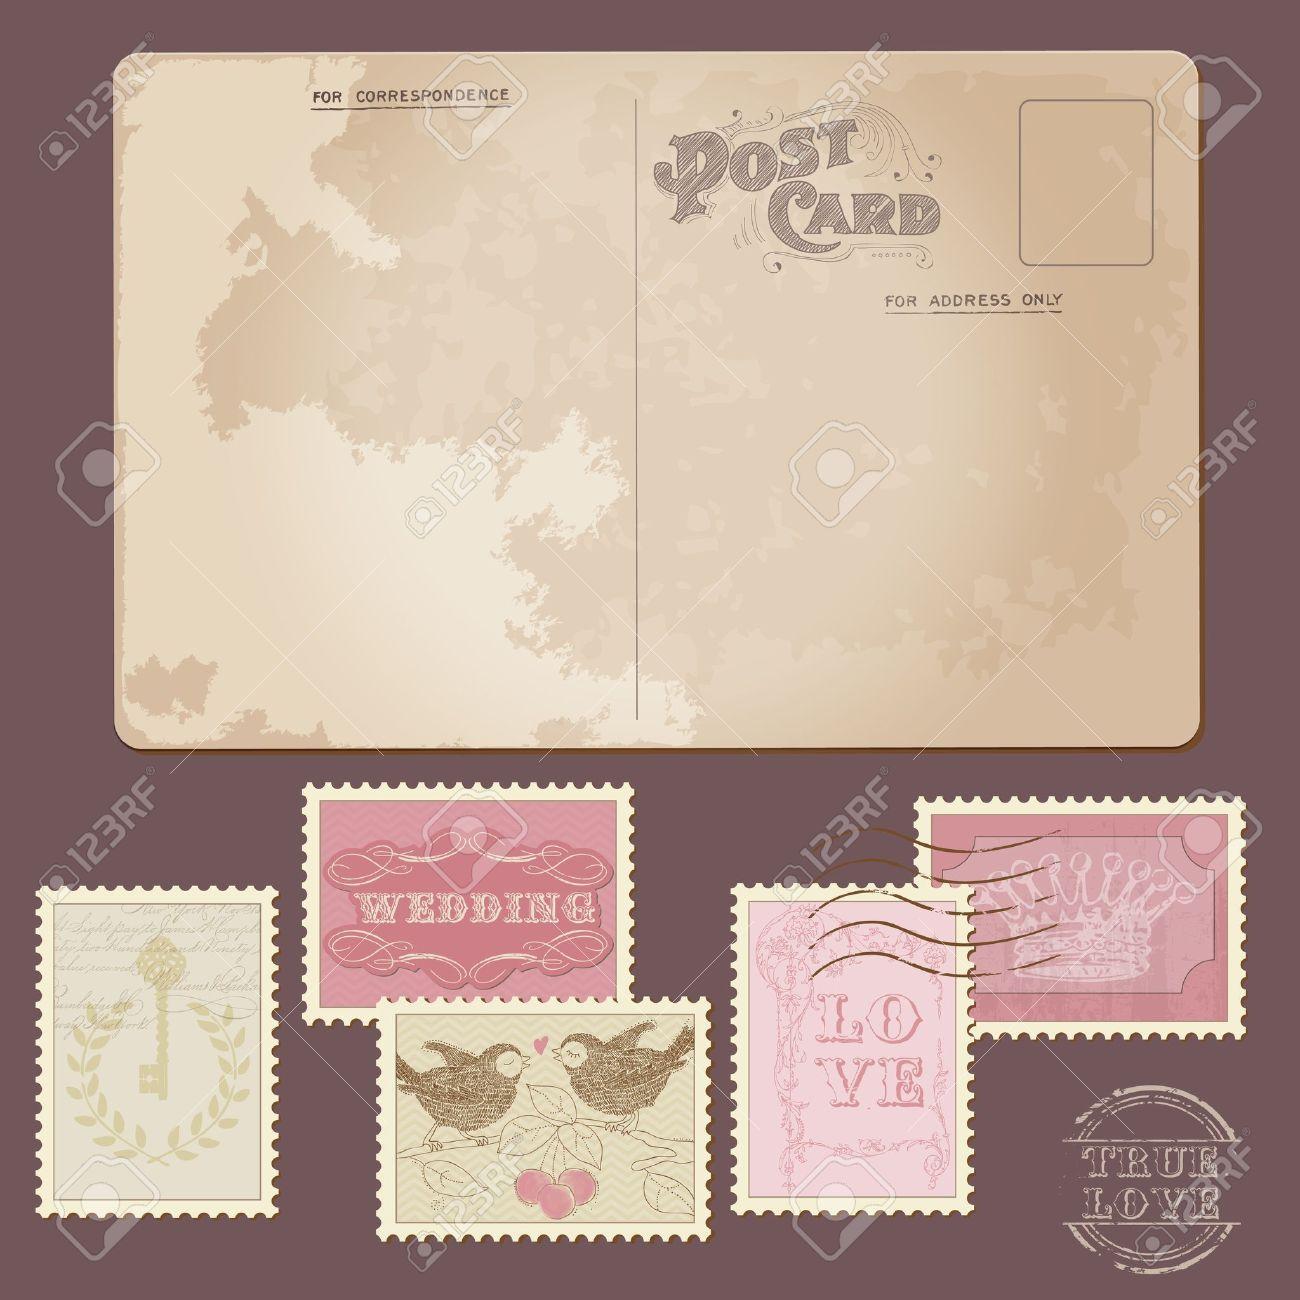 personalised wedding stamp wedding postage stamps Wedding Invitation Stamp